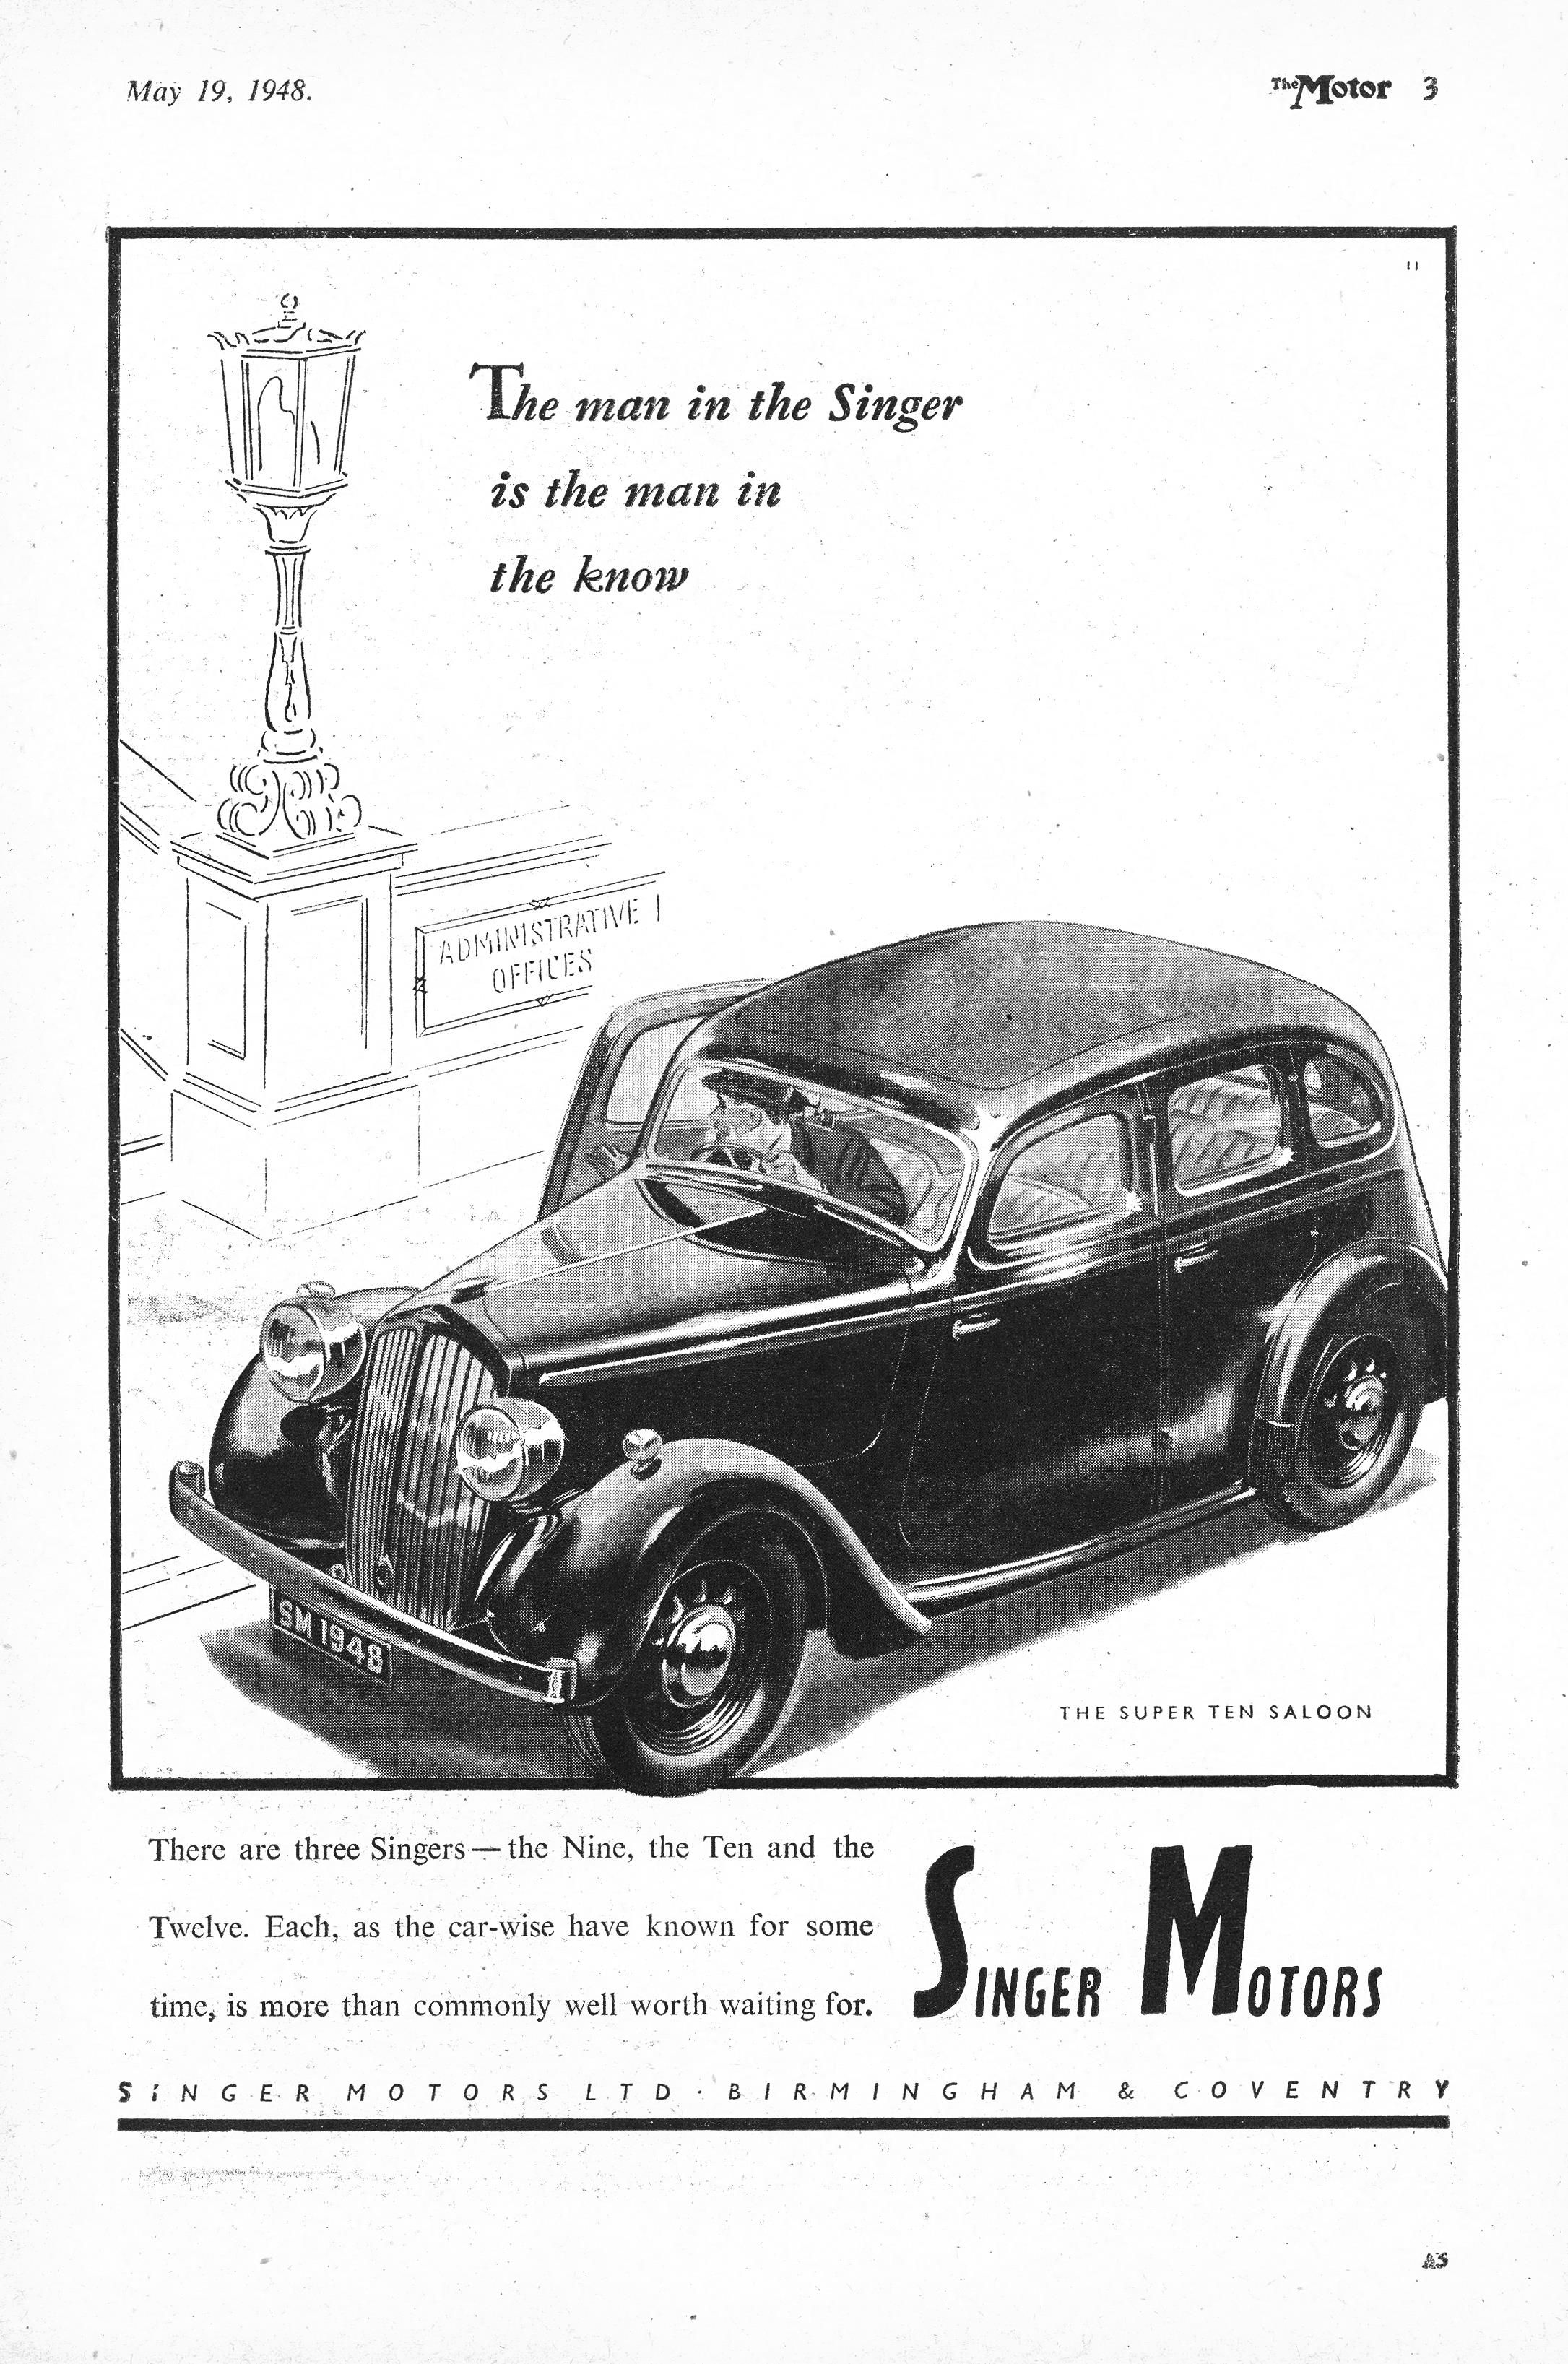 Singer Ten Motor Car Autocar Advert 1948 | Old Car Ads | Pinterest ...